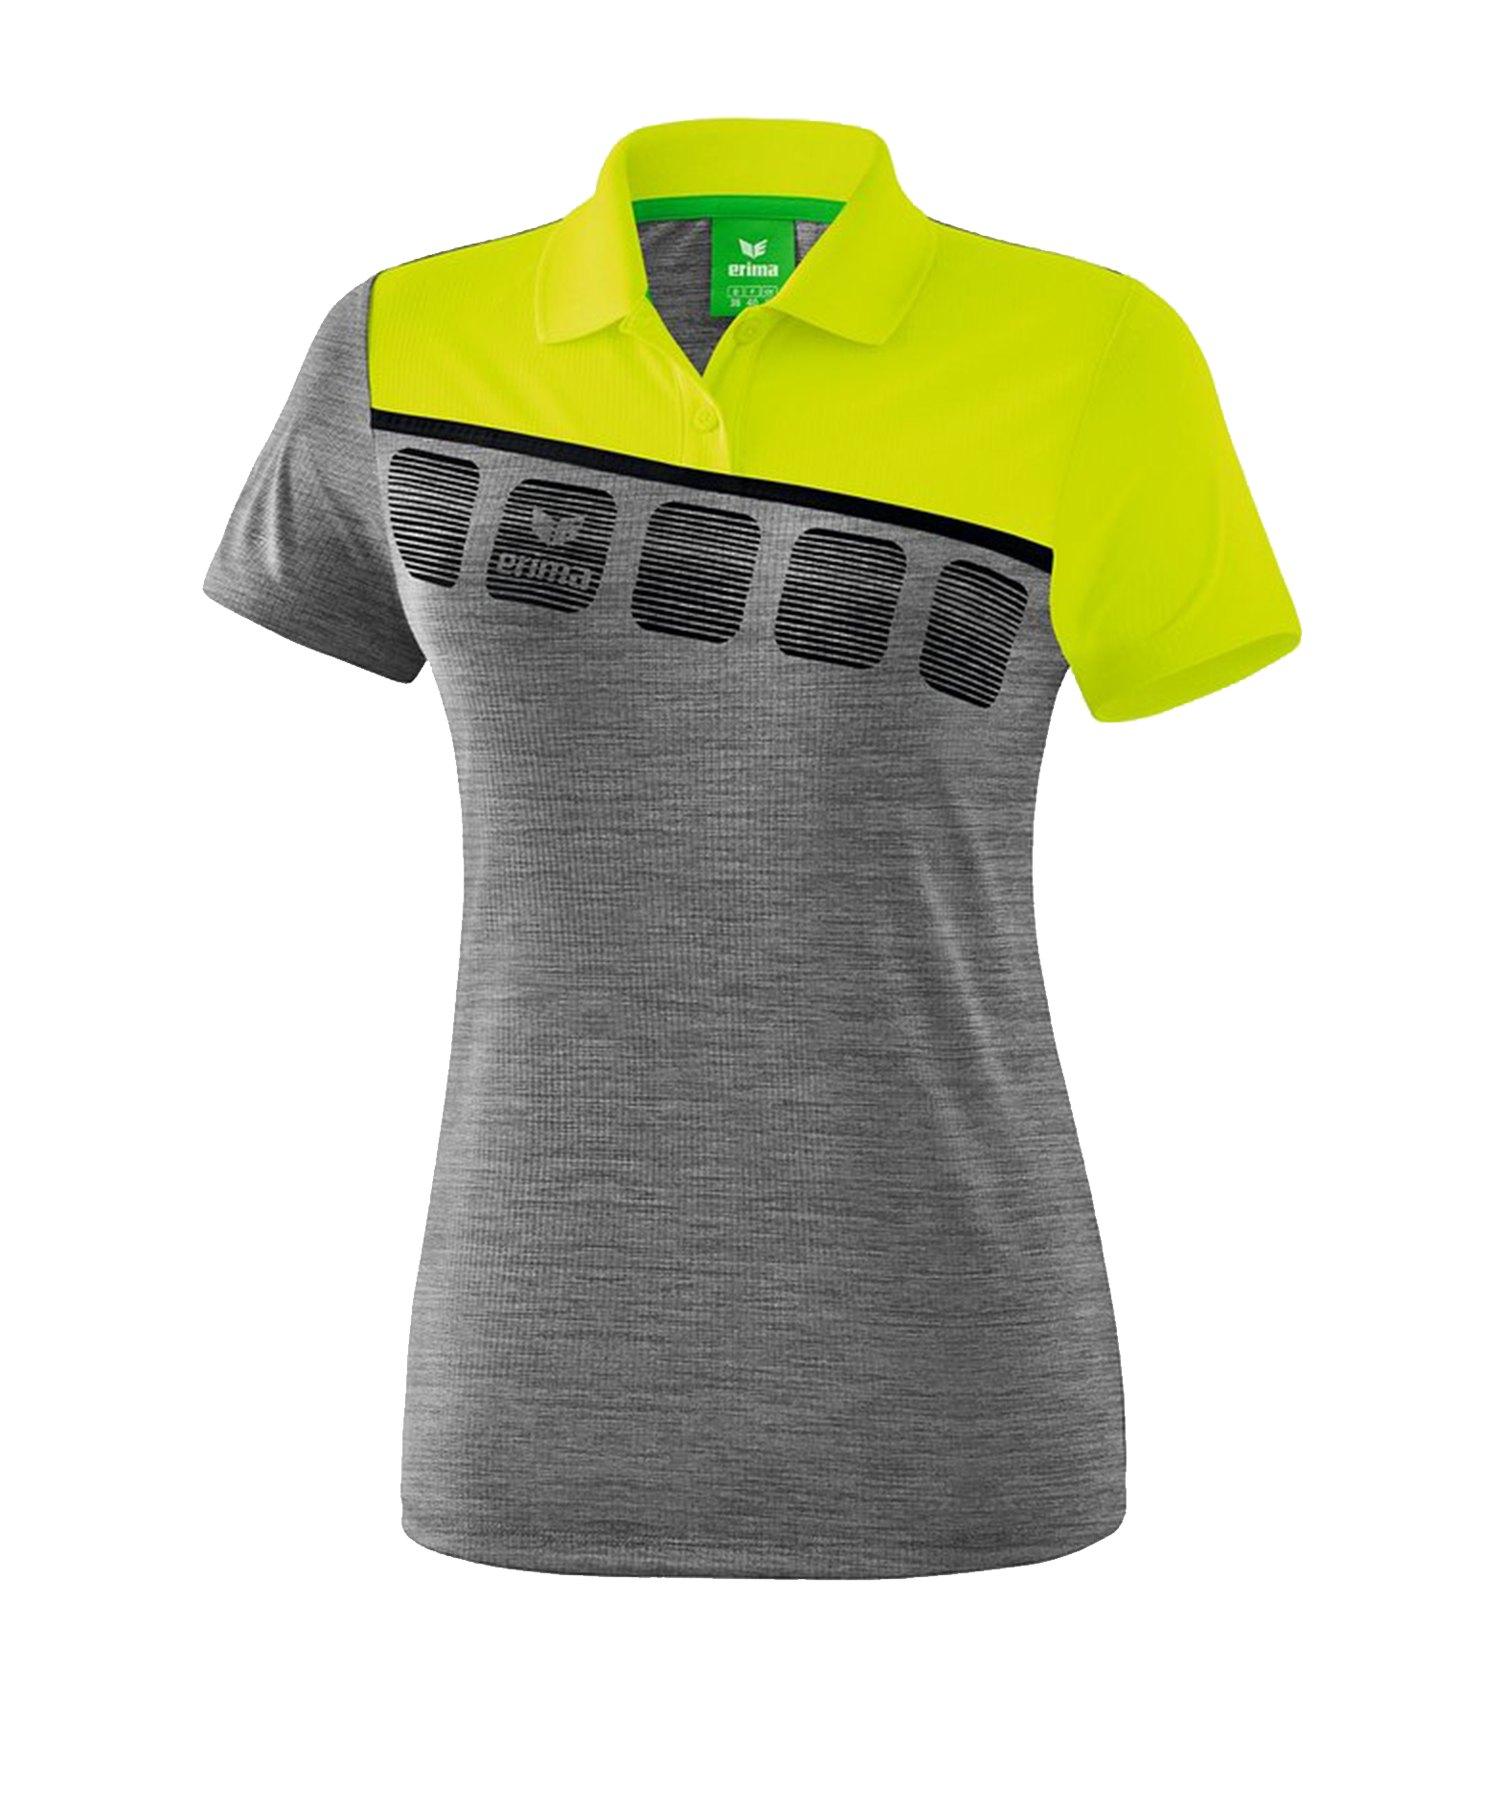 Erima 5-C Poloshirt Damen Grau Grün - Grau